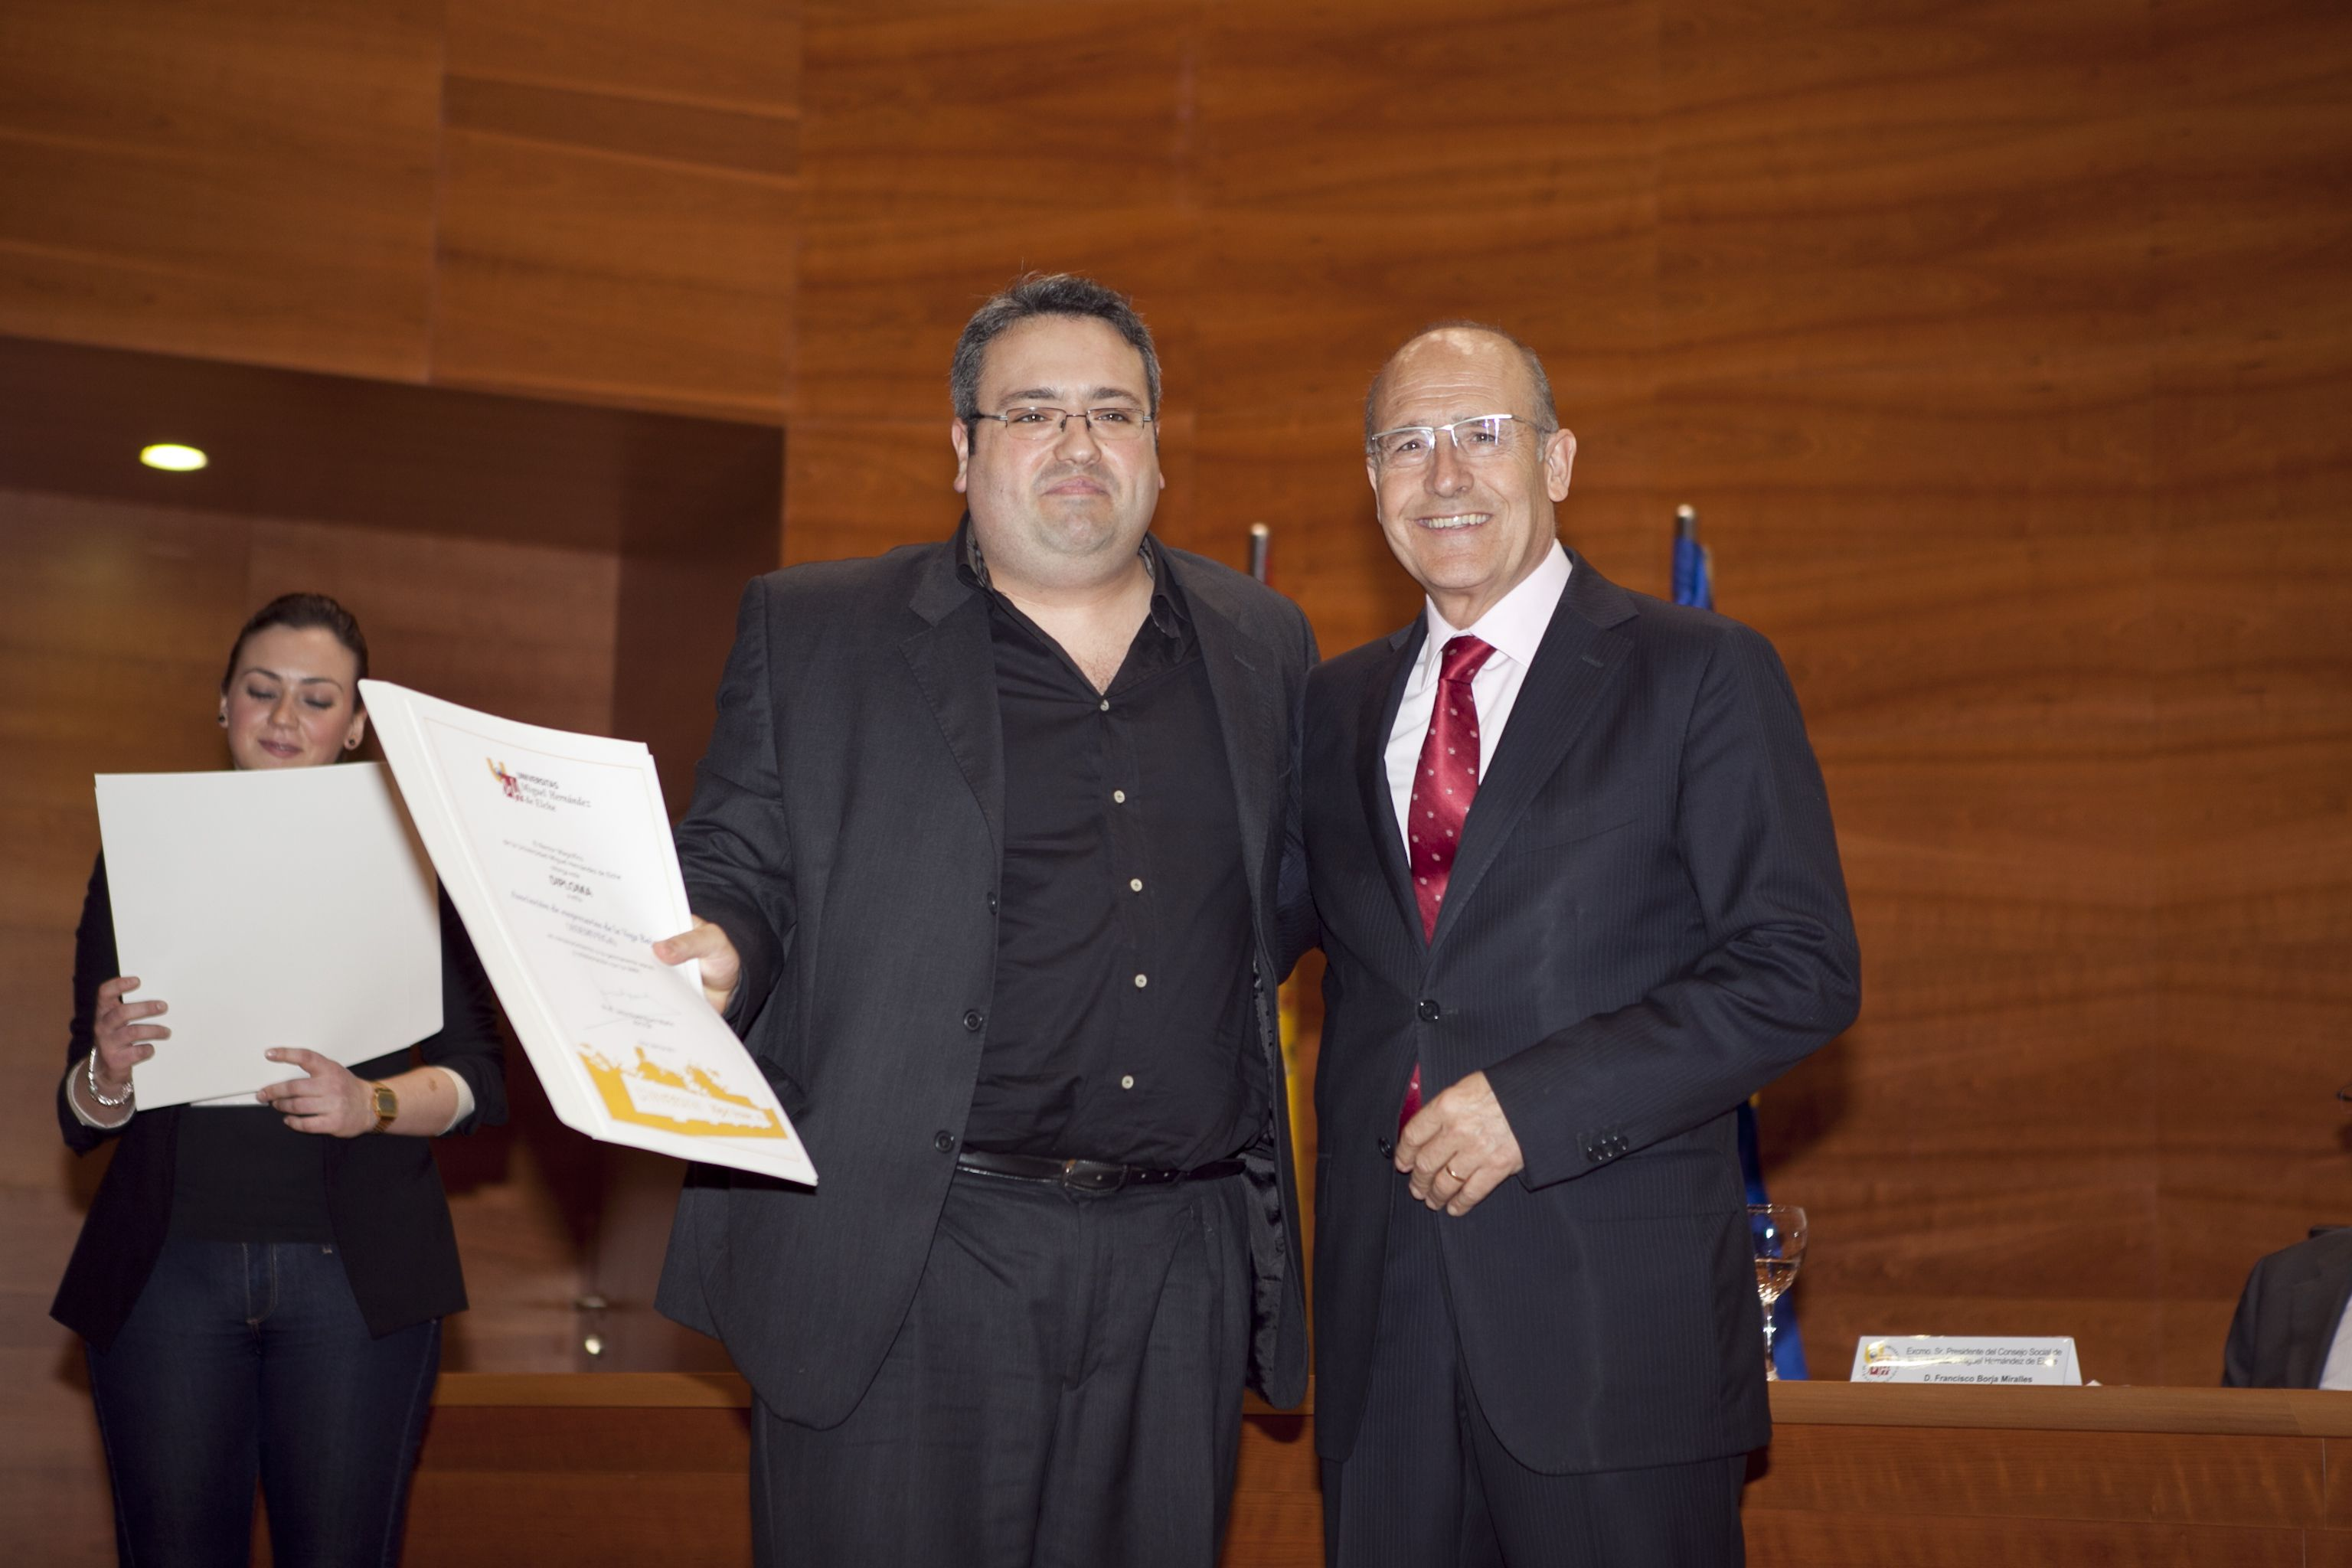 umh-diplomas-rector_mg_6543.jpg